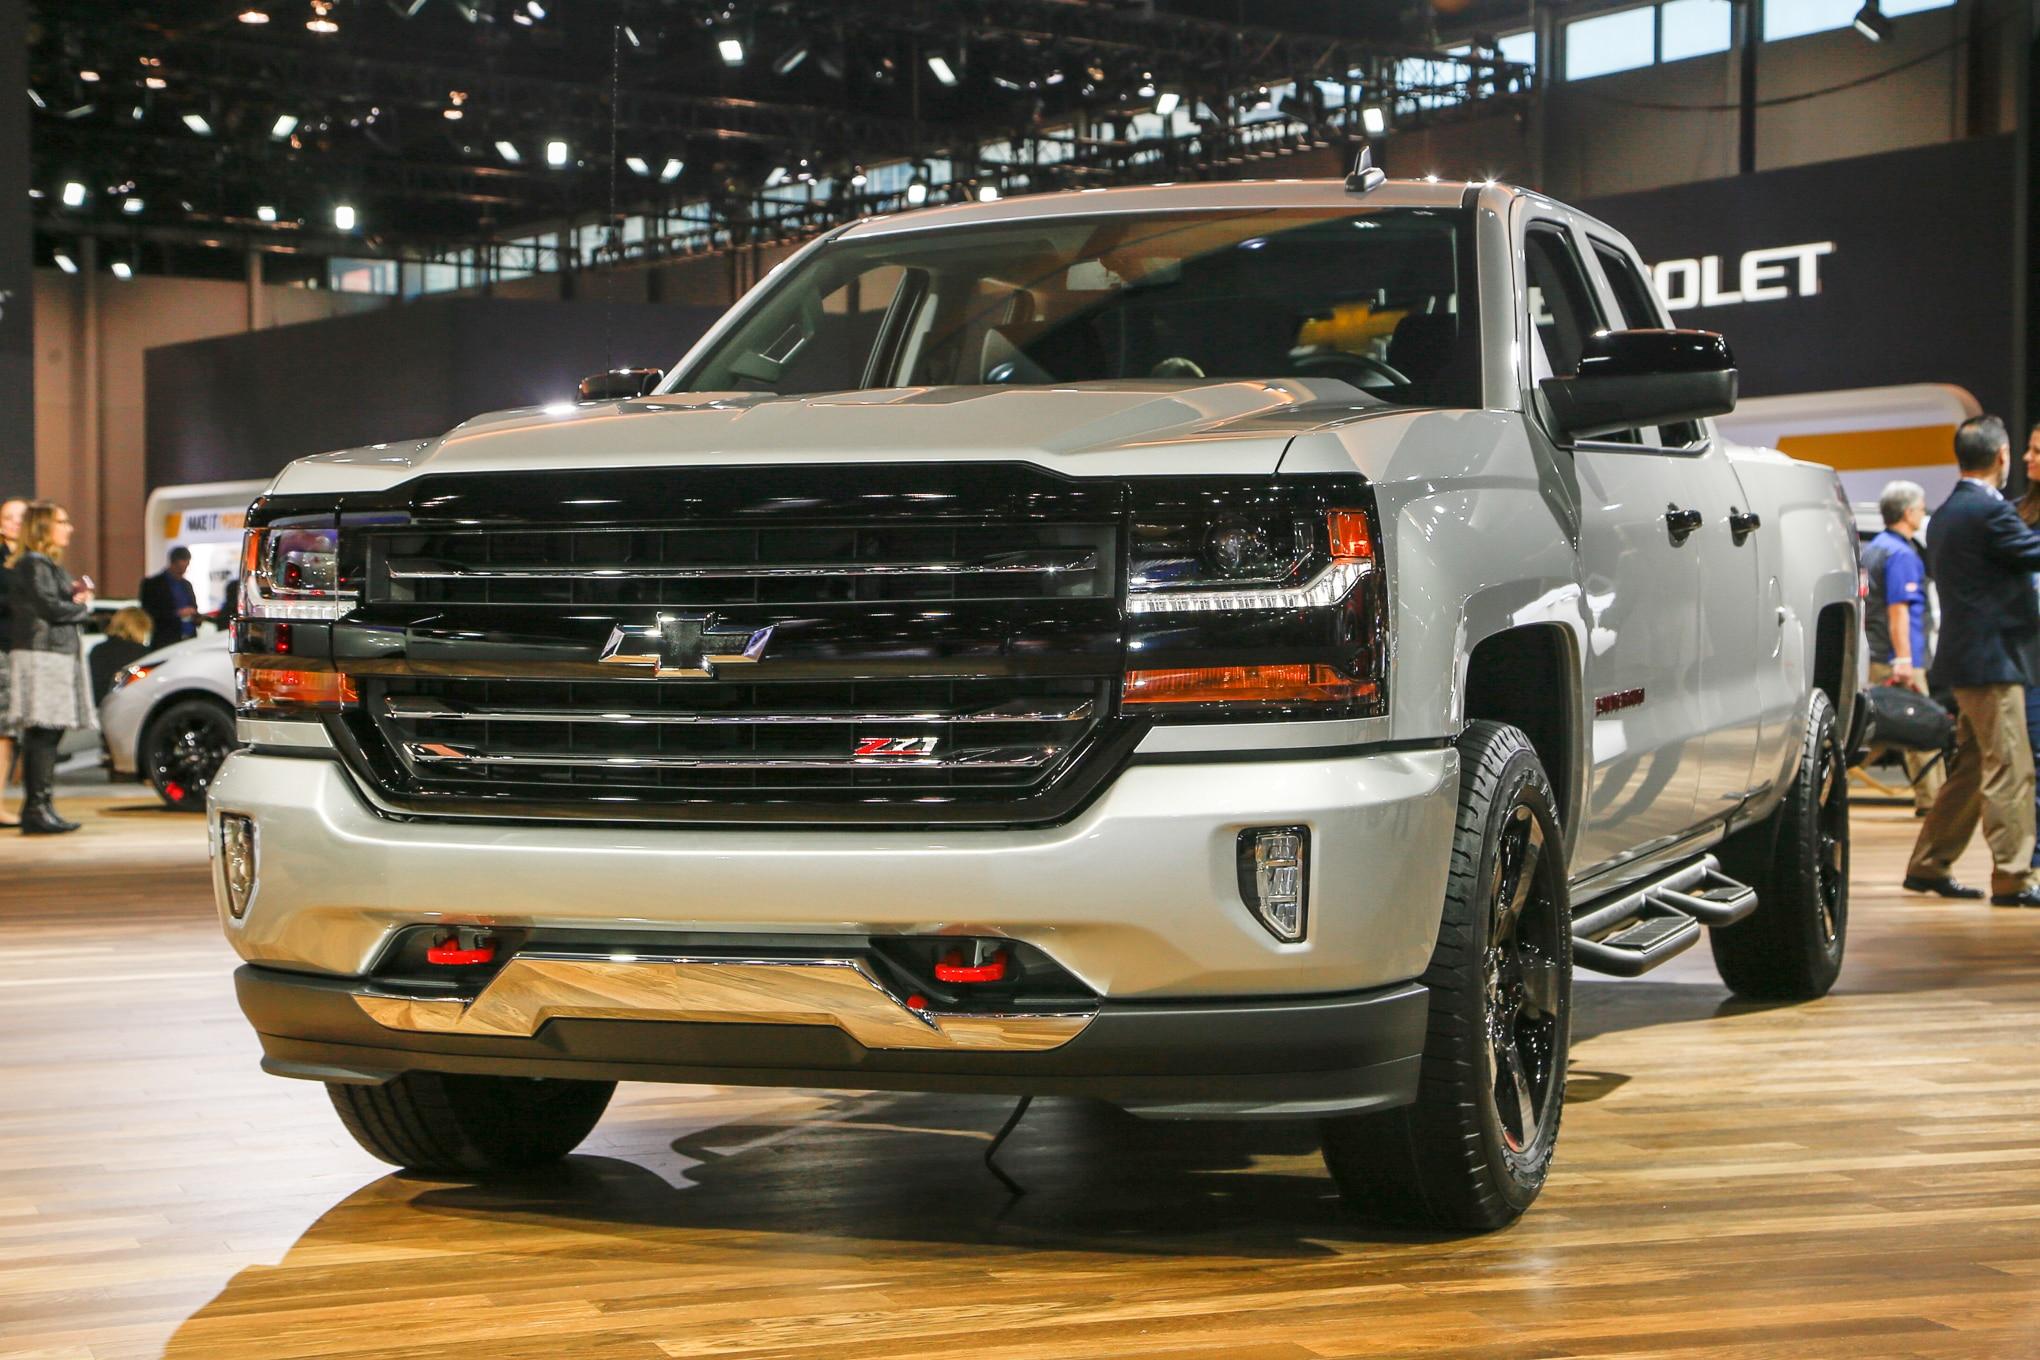 2017 Ss Chevrolet >> Chevrolet Adds Redline Edition to 13 Vehicles   Automobile Magazine